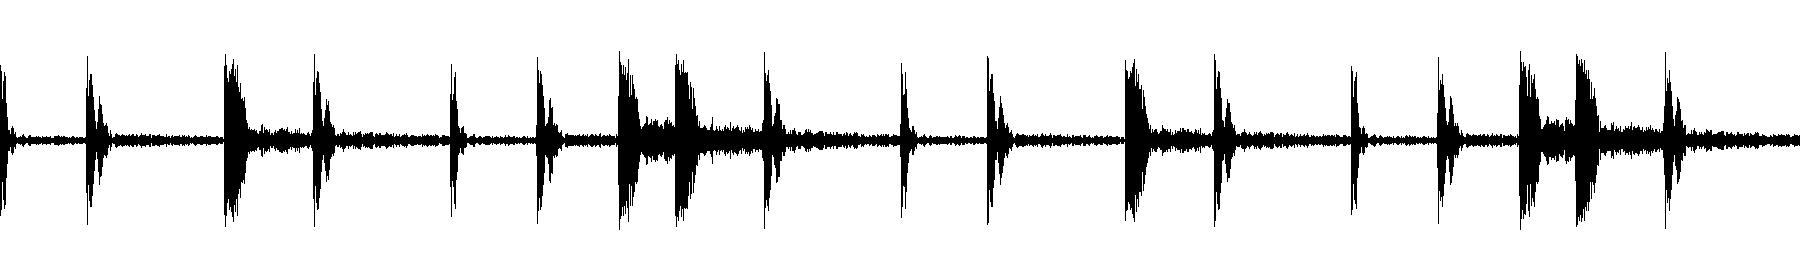 pth synth 22